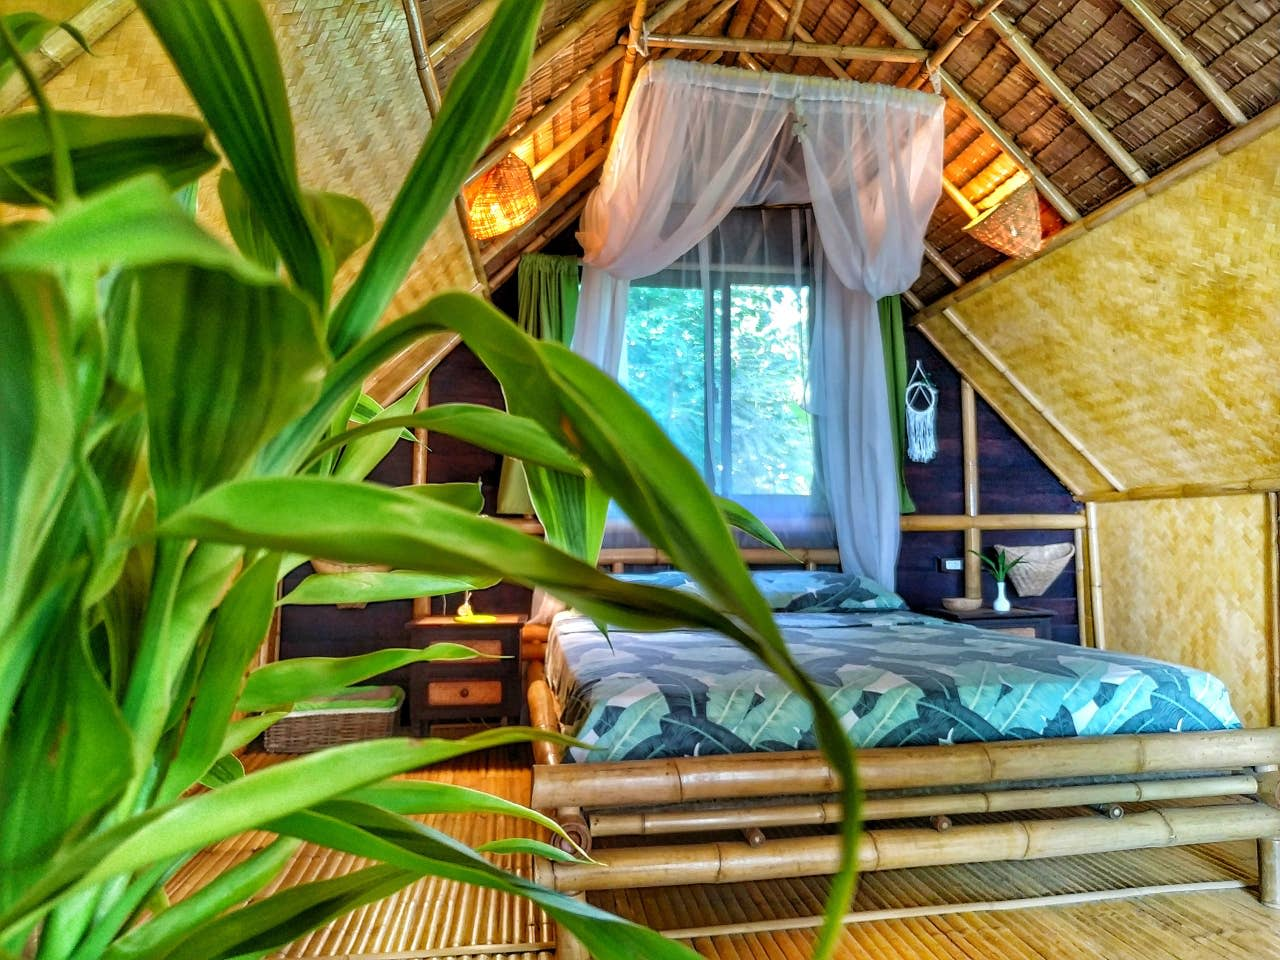 eco-loft thailand bamboo bungalow bedroom